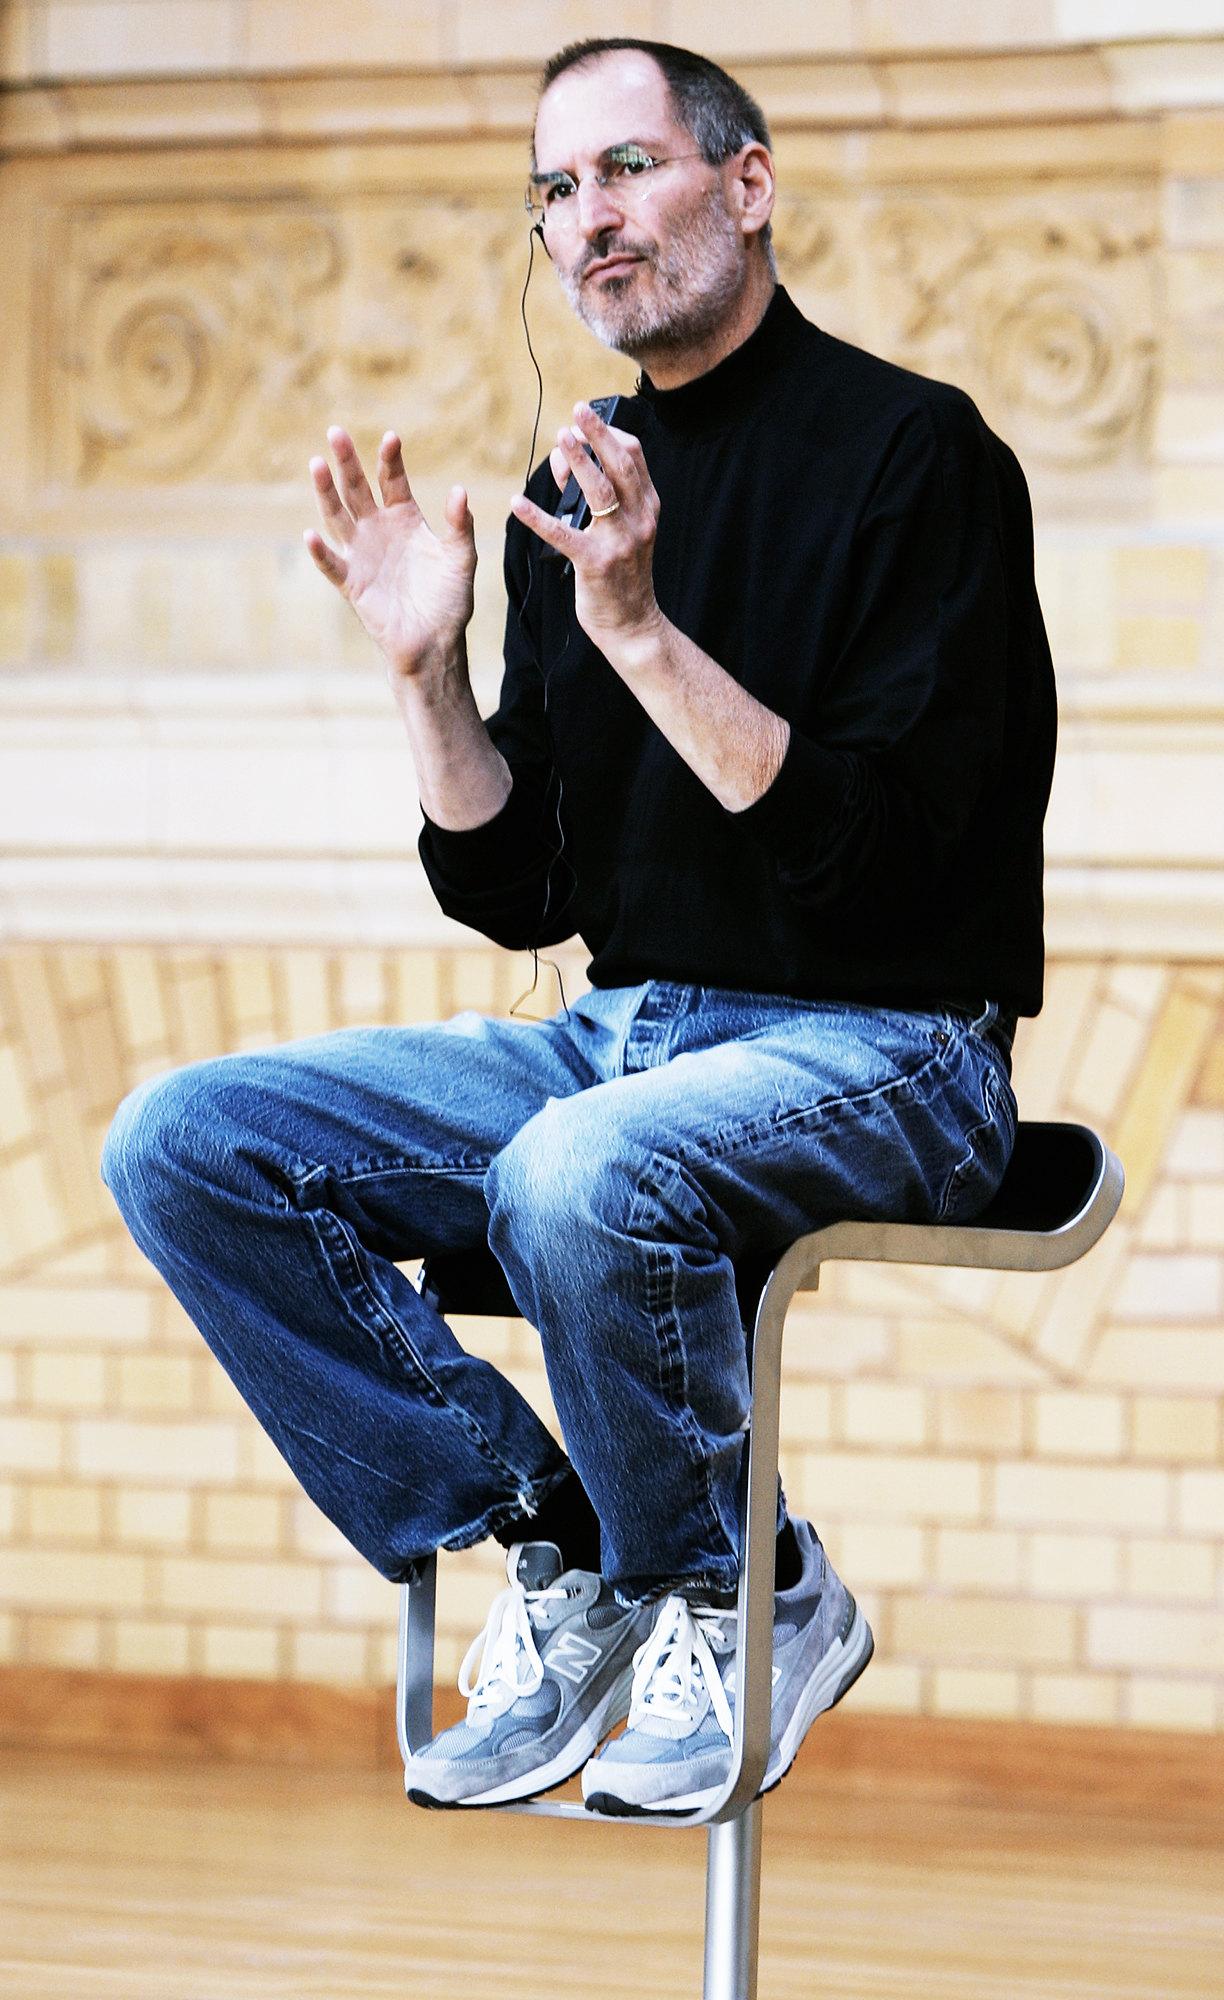 Steve Jobs NB